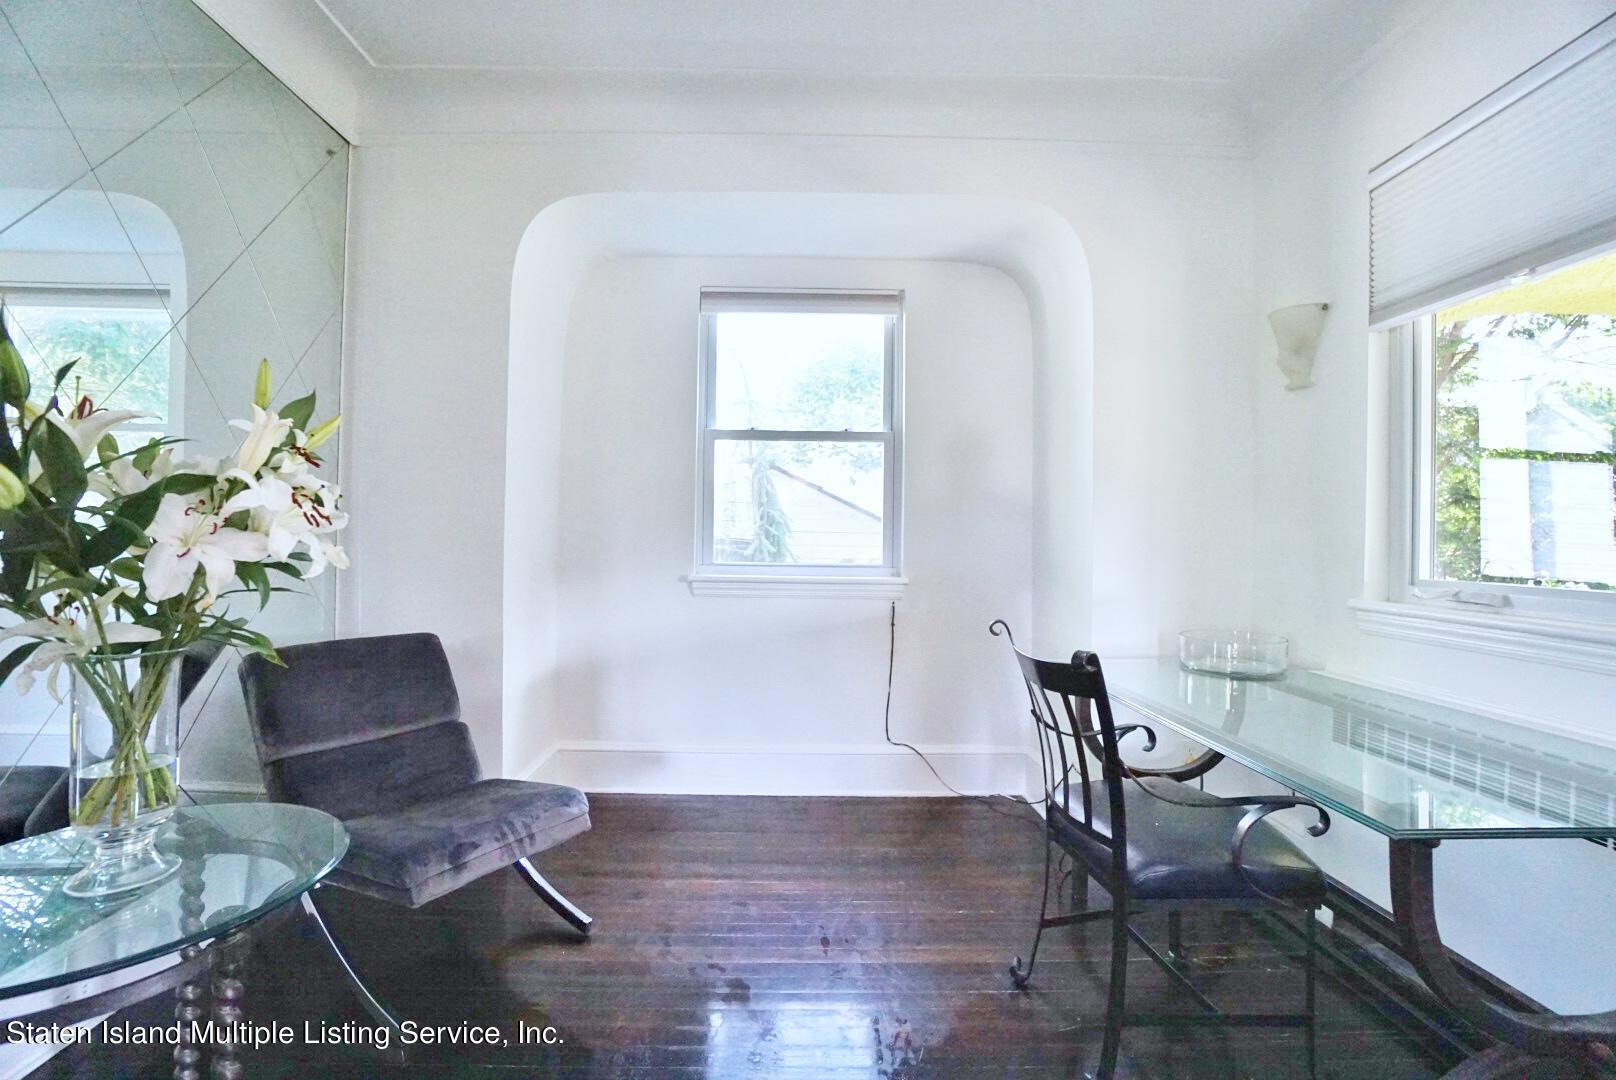 Single Family - Detached 311 Bement Avenue  Staten Island, NY 10310, MLS-1147133-10